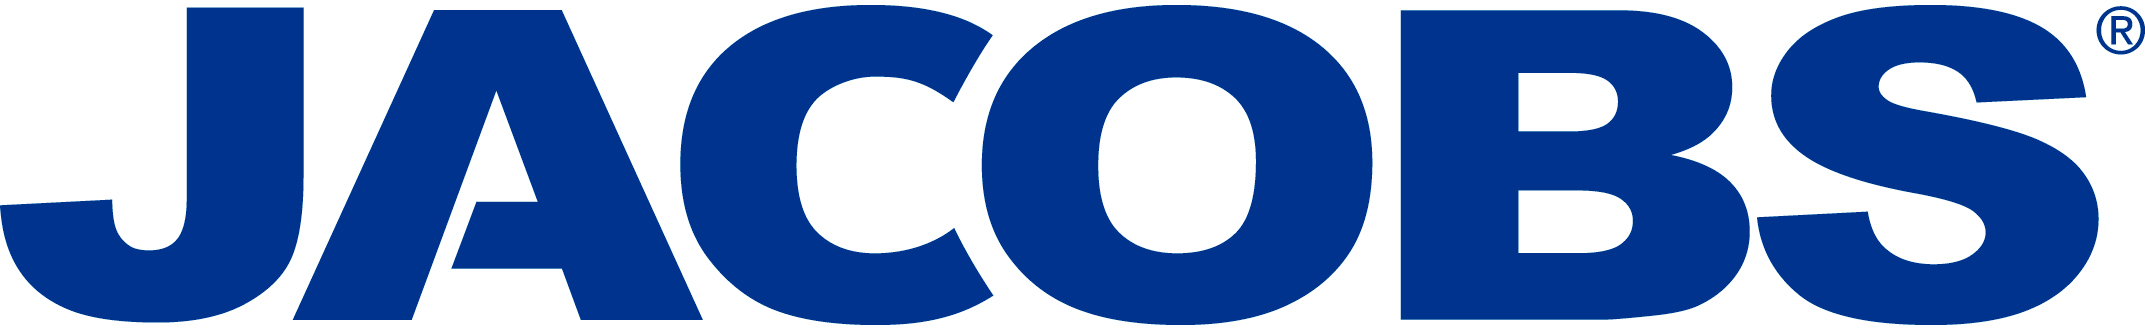 Jacobs_Logo_Blue